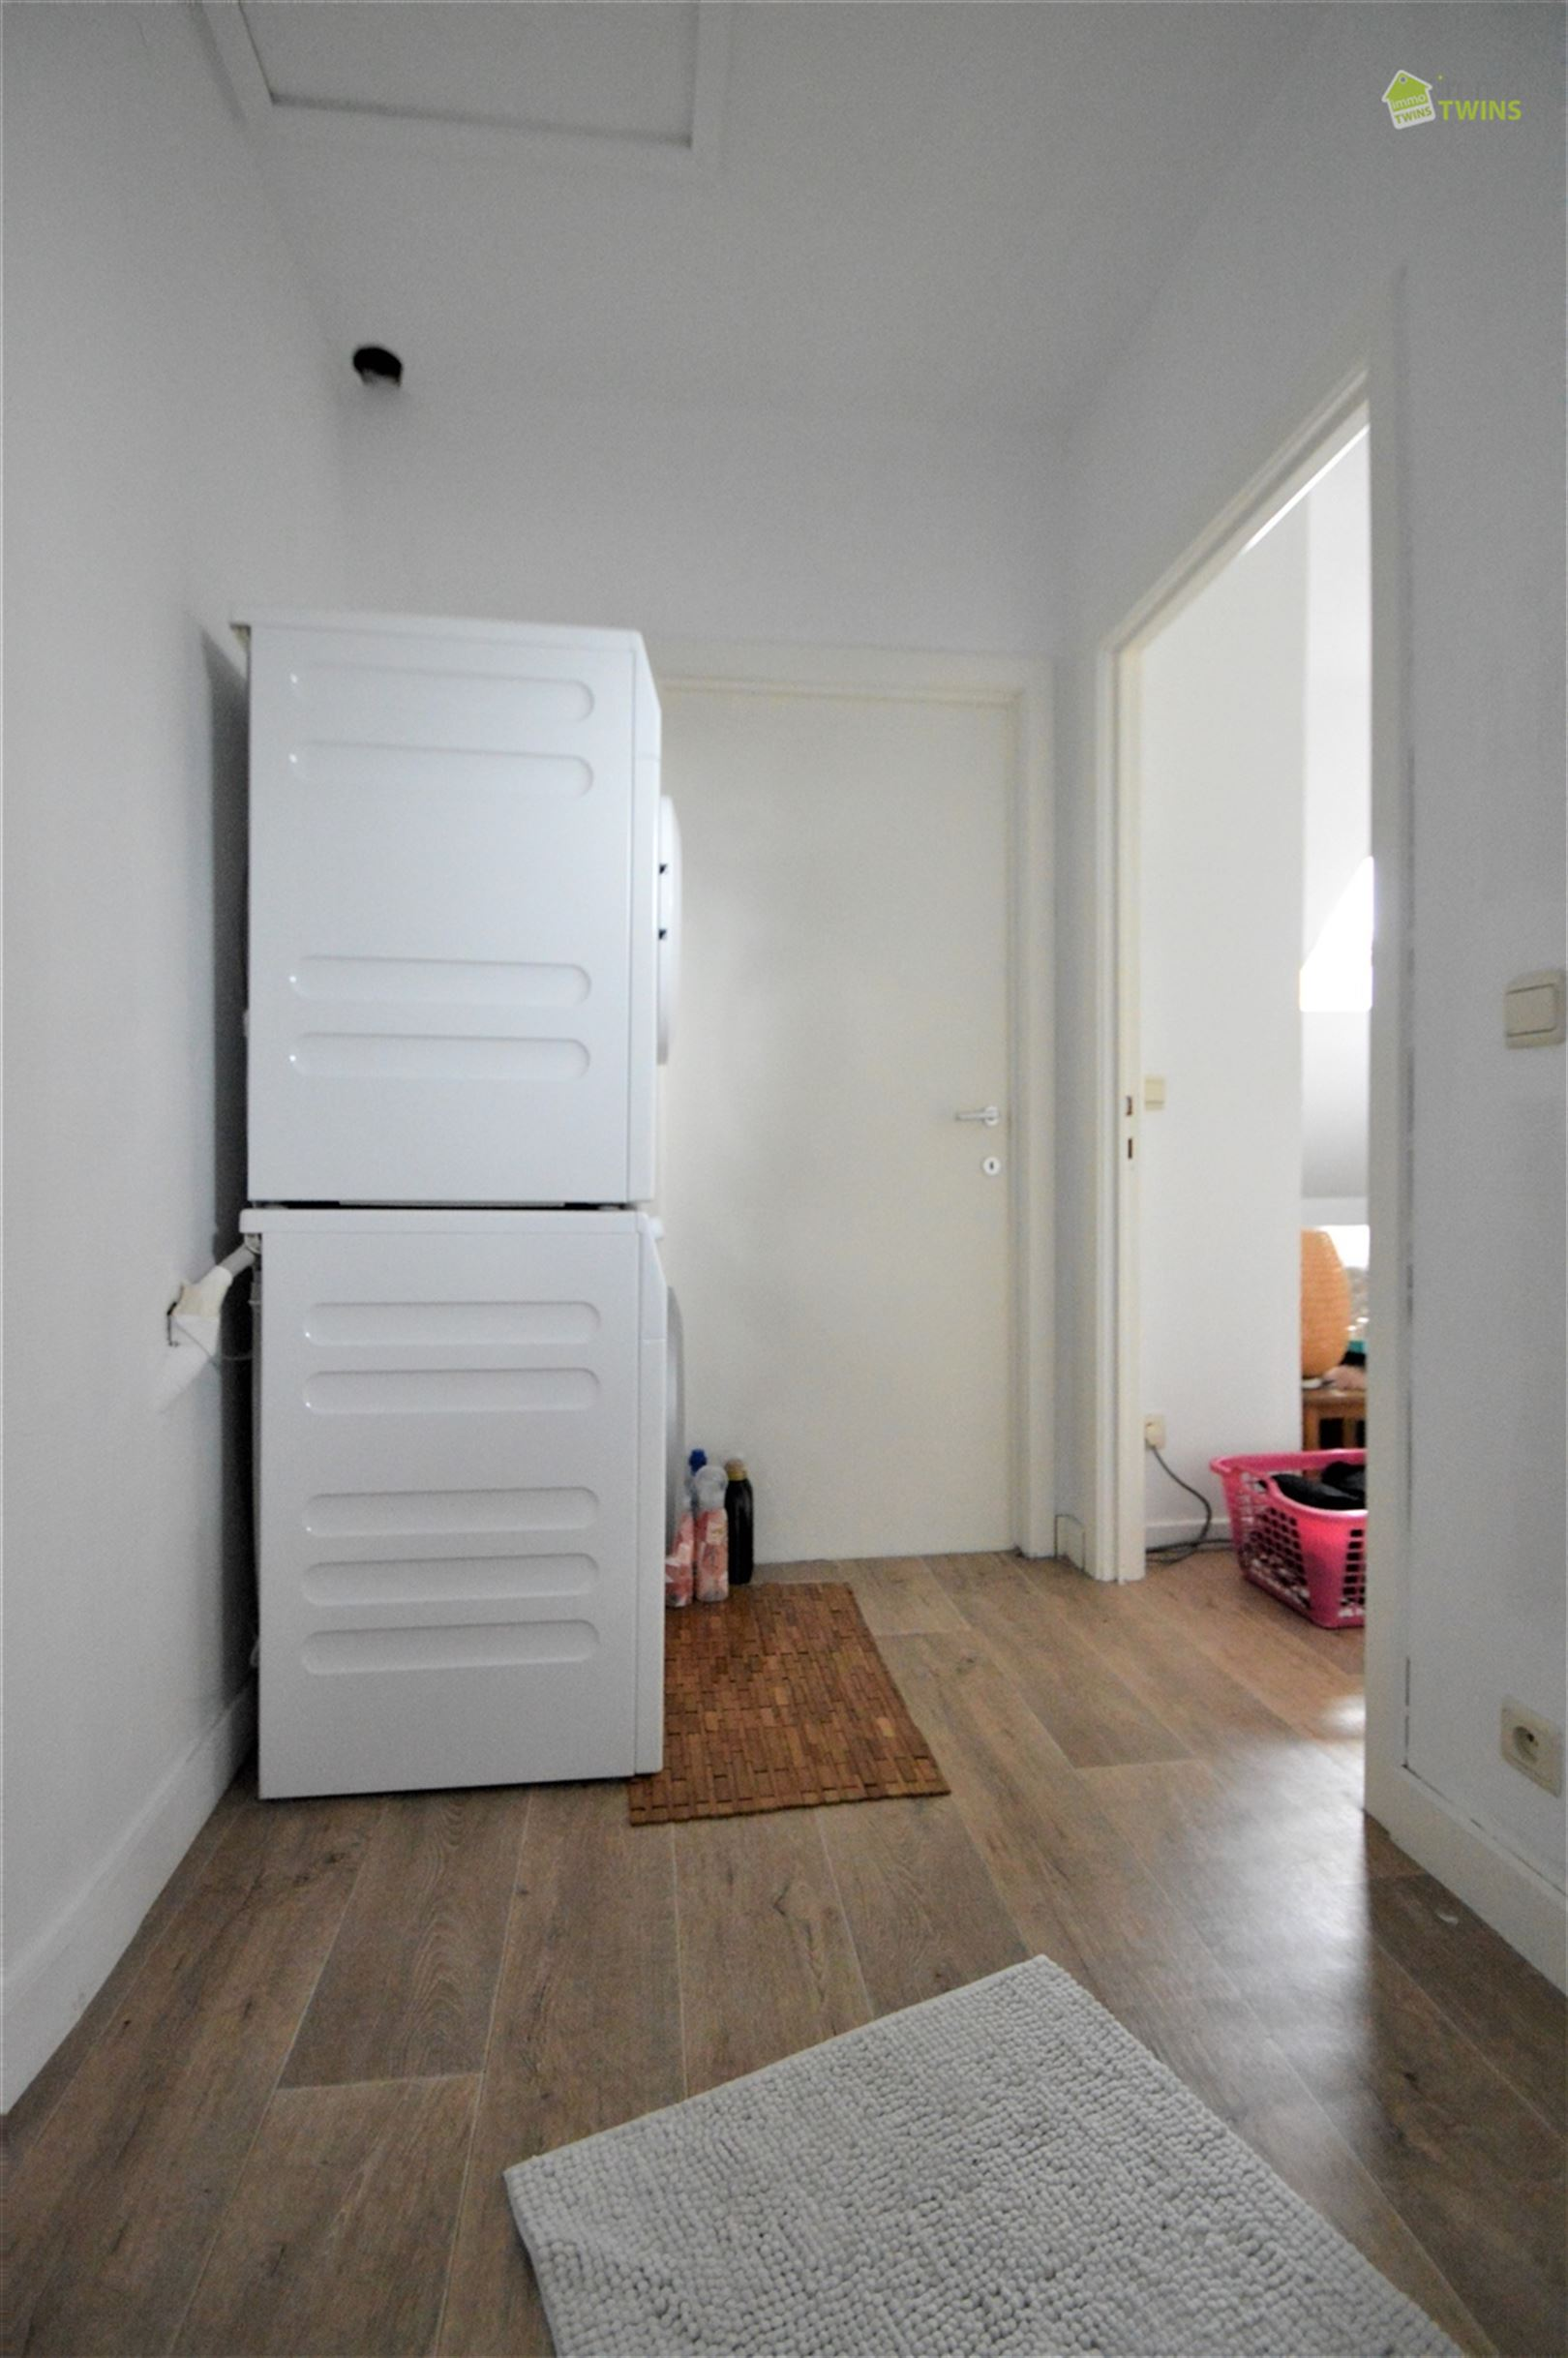 Foto 6 : Duplex/triplex te 9200 DENDERMONDE (België) - Prijs € 650